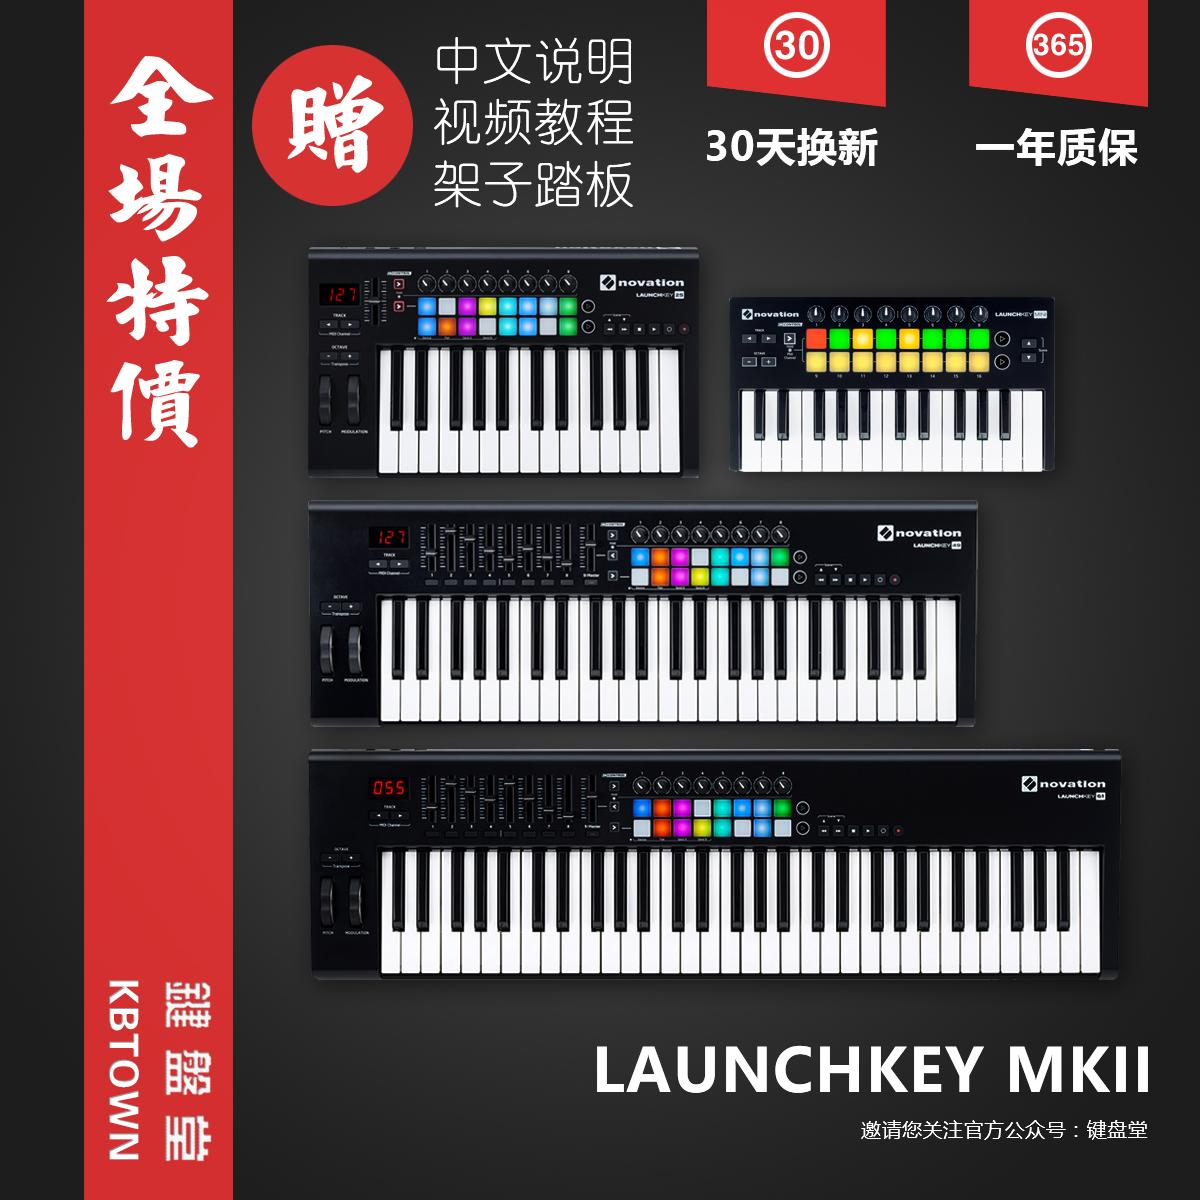 【Зал клавиатуры】 в подарок полка в подарок Шаг NOVATION LAUNCHKEY 61 49 25 MINI MK2 MKII